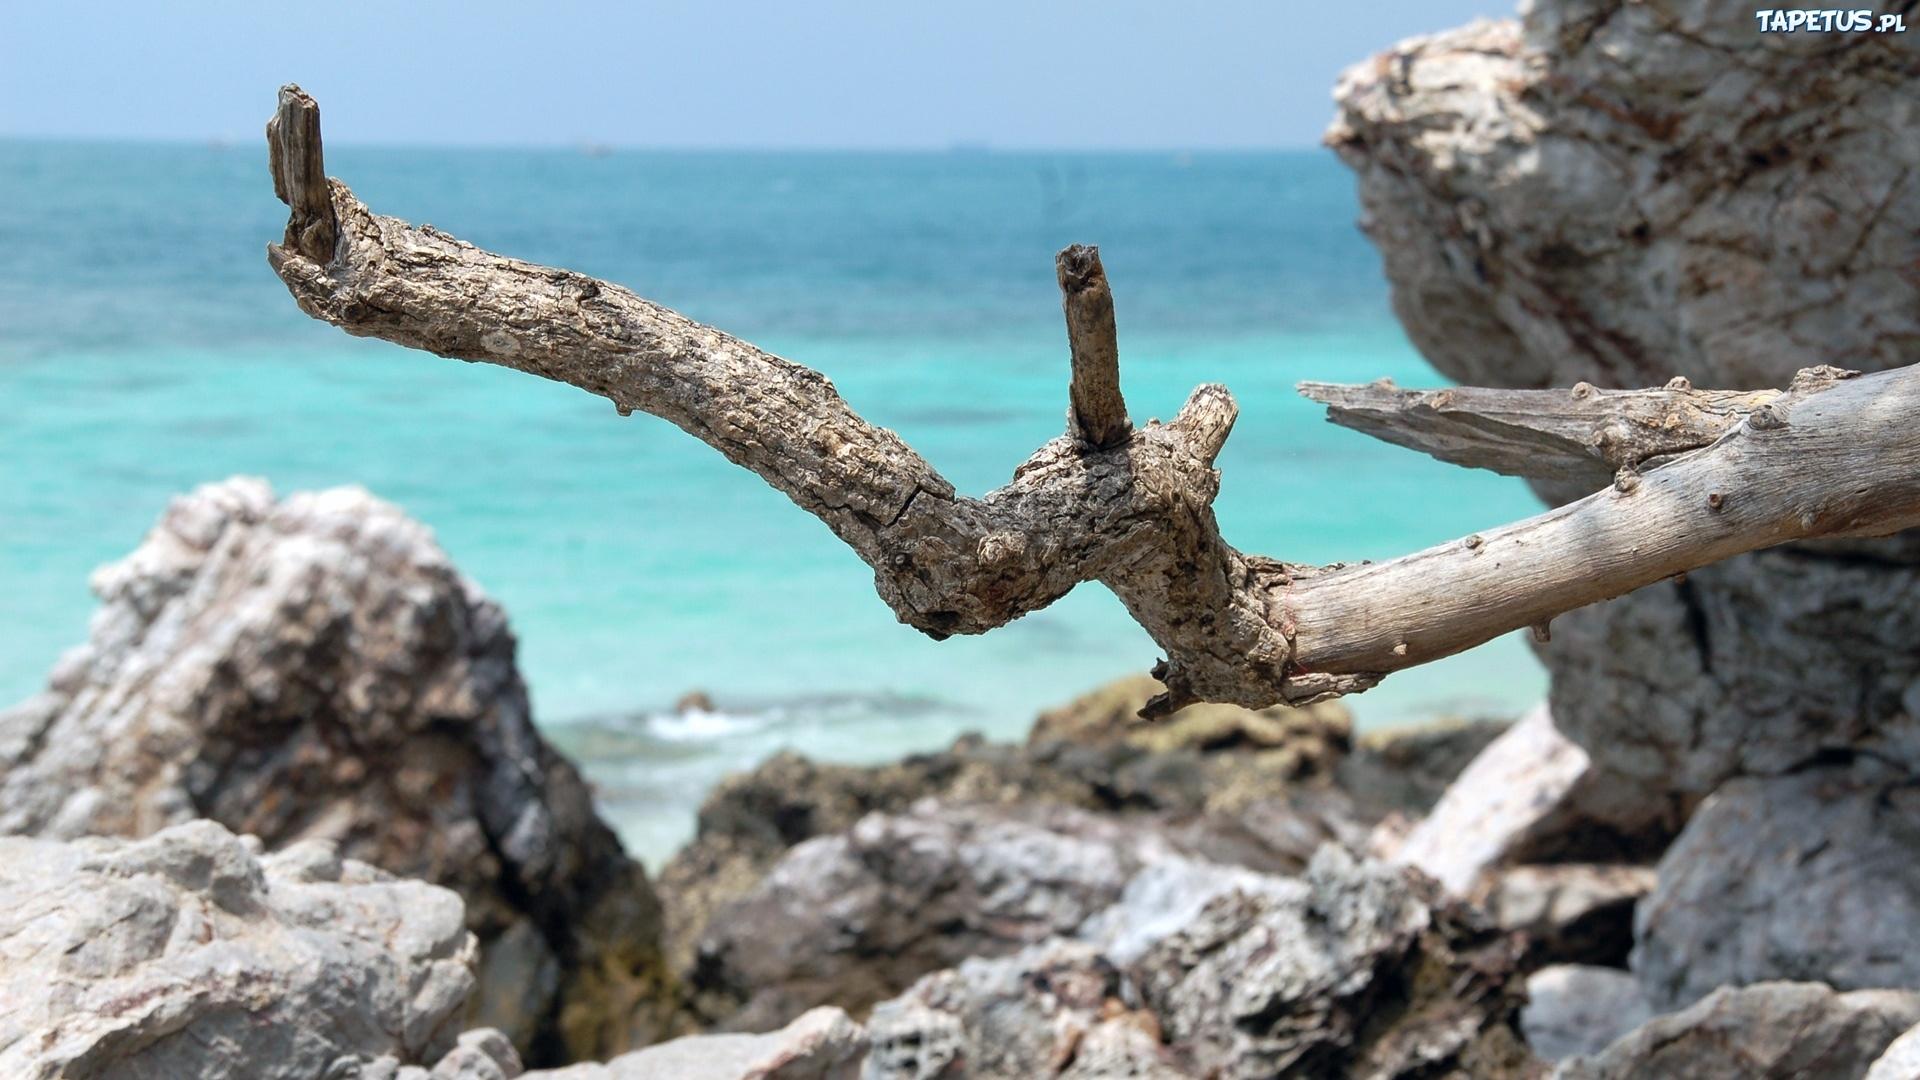 Сухое дерево на пляже без смс